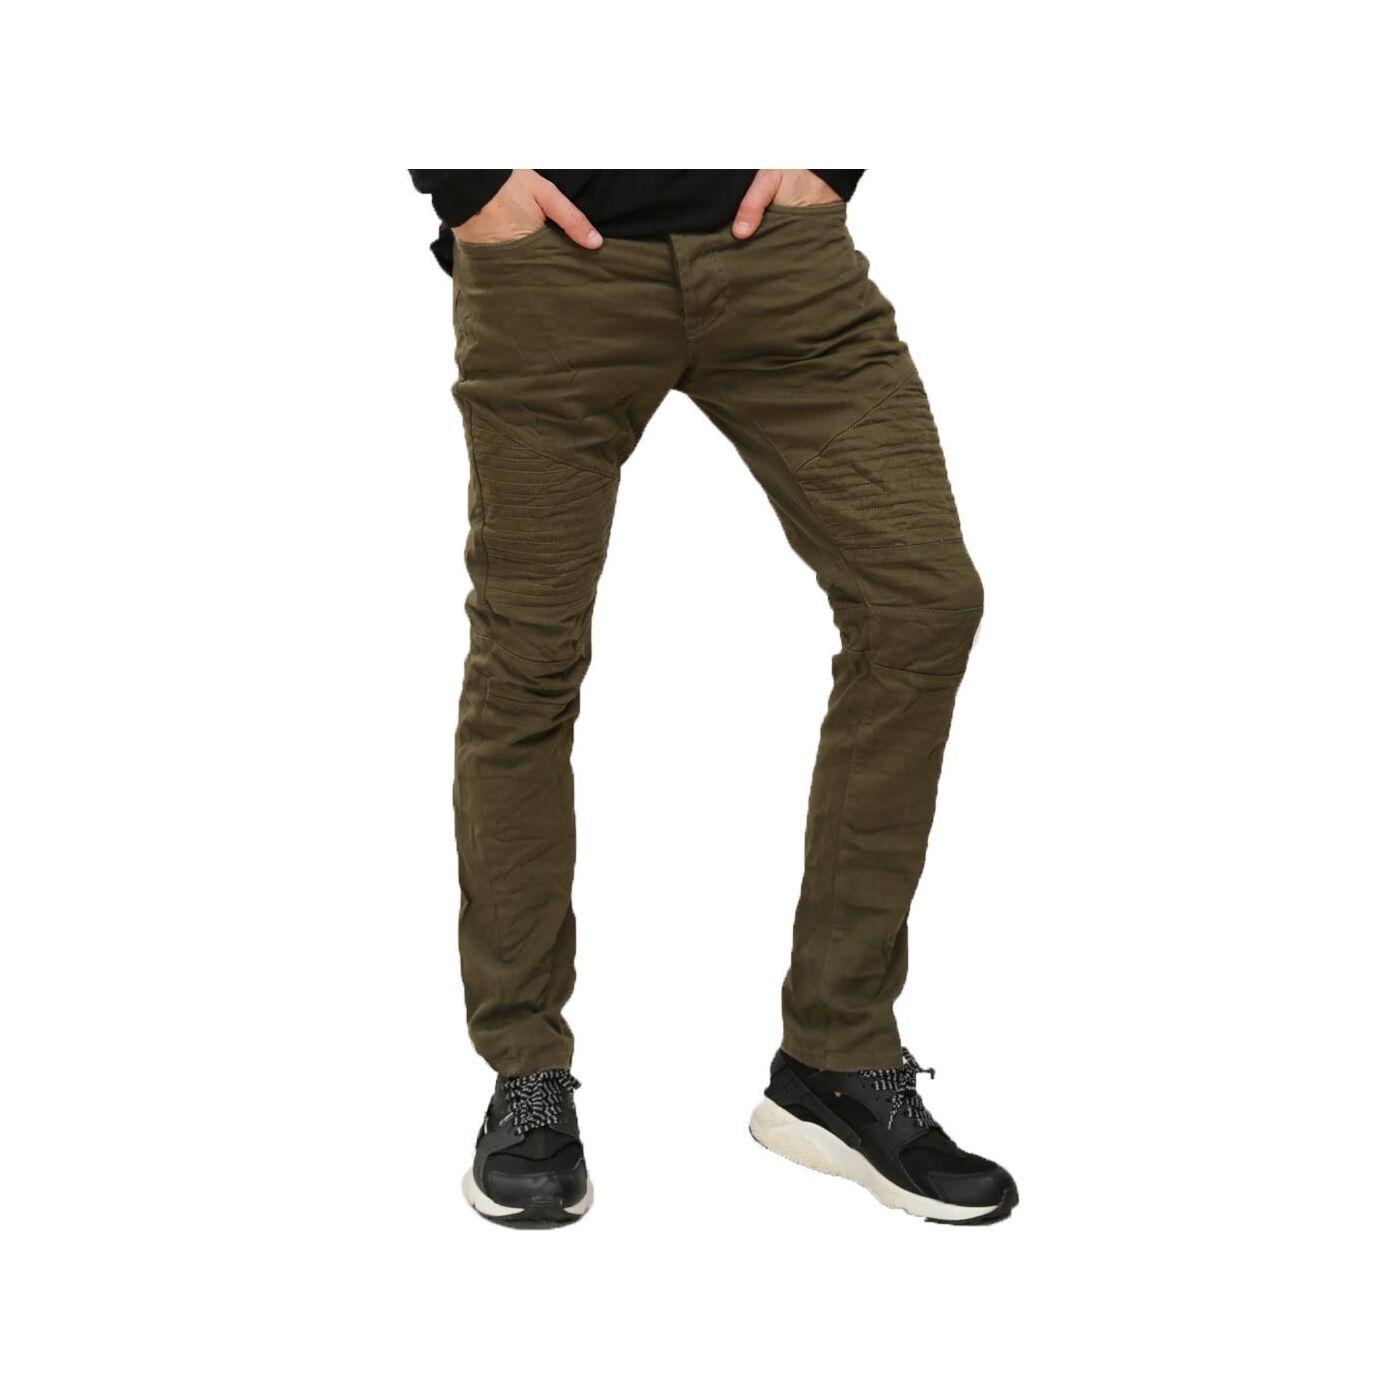 red bridge herren jeans hose biker khaki 36 99. Black Bedroom Furniture Sets. Home Design Ideas